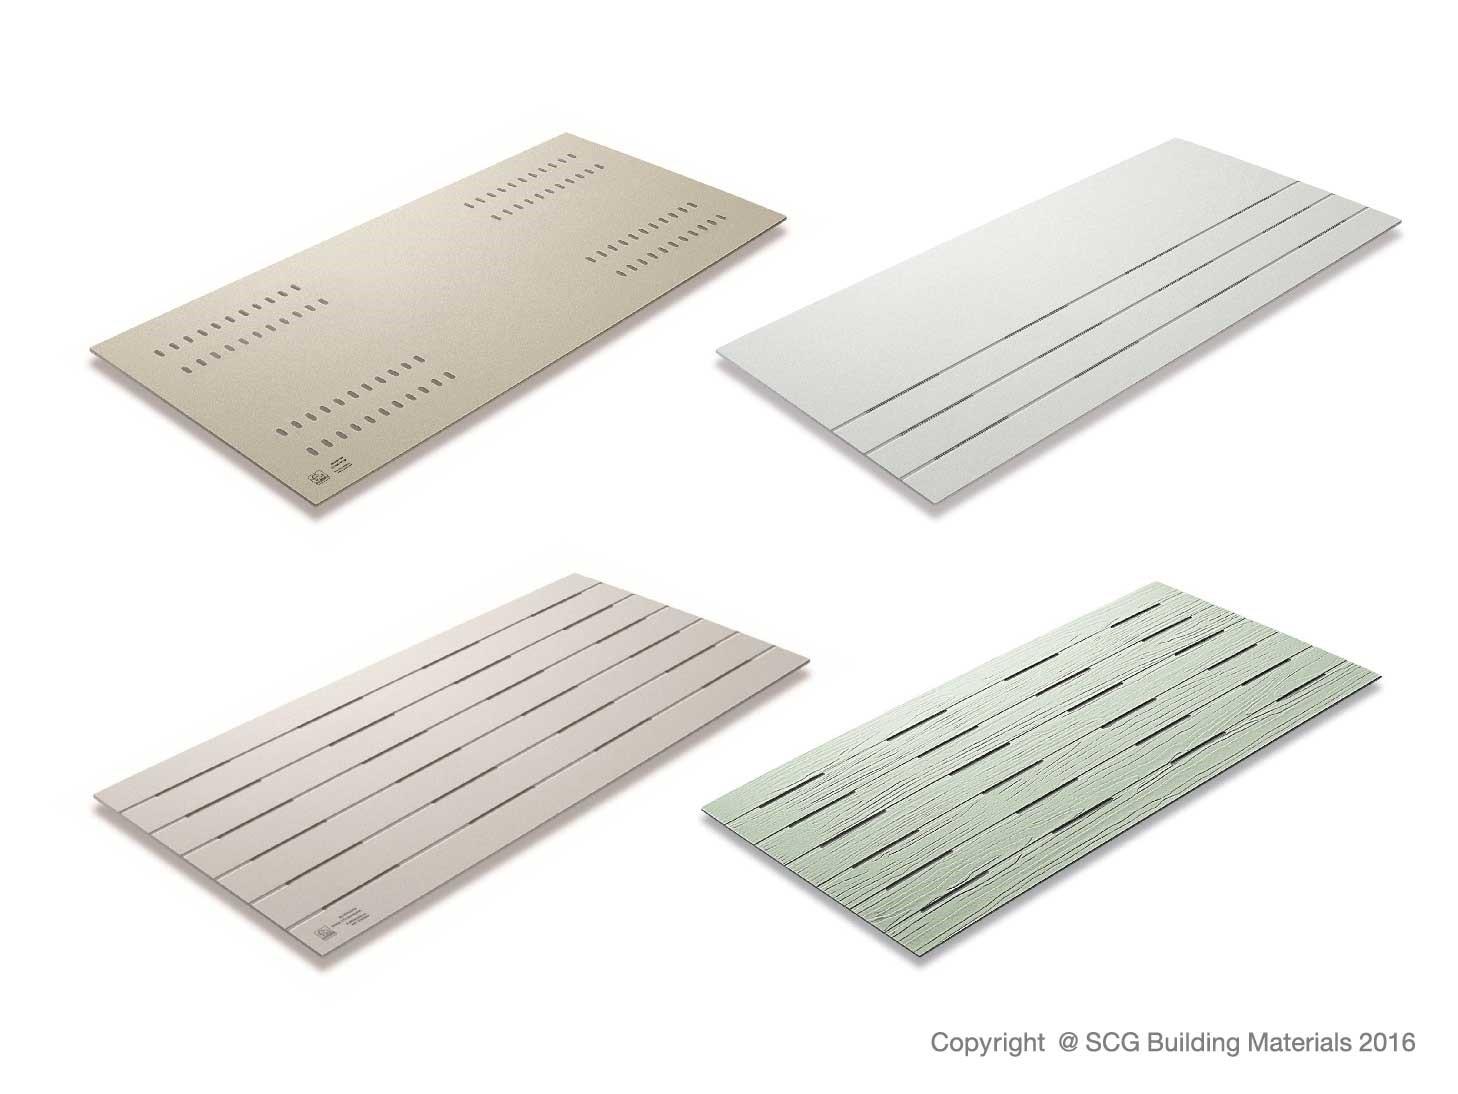 SCG Fiber Cement Board Ventilation Series - top quality fiber cement board ventilation